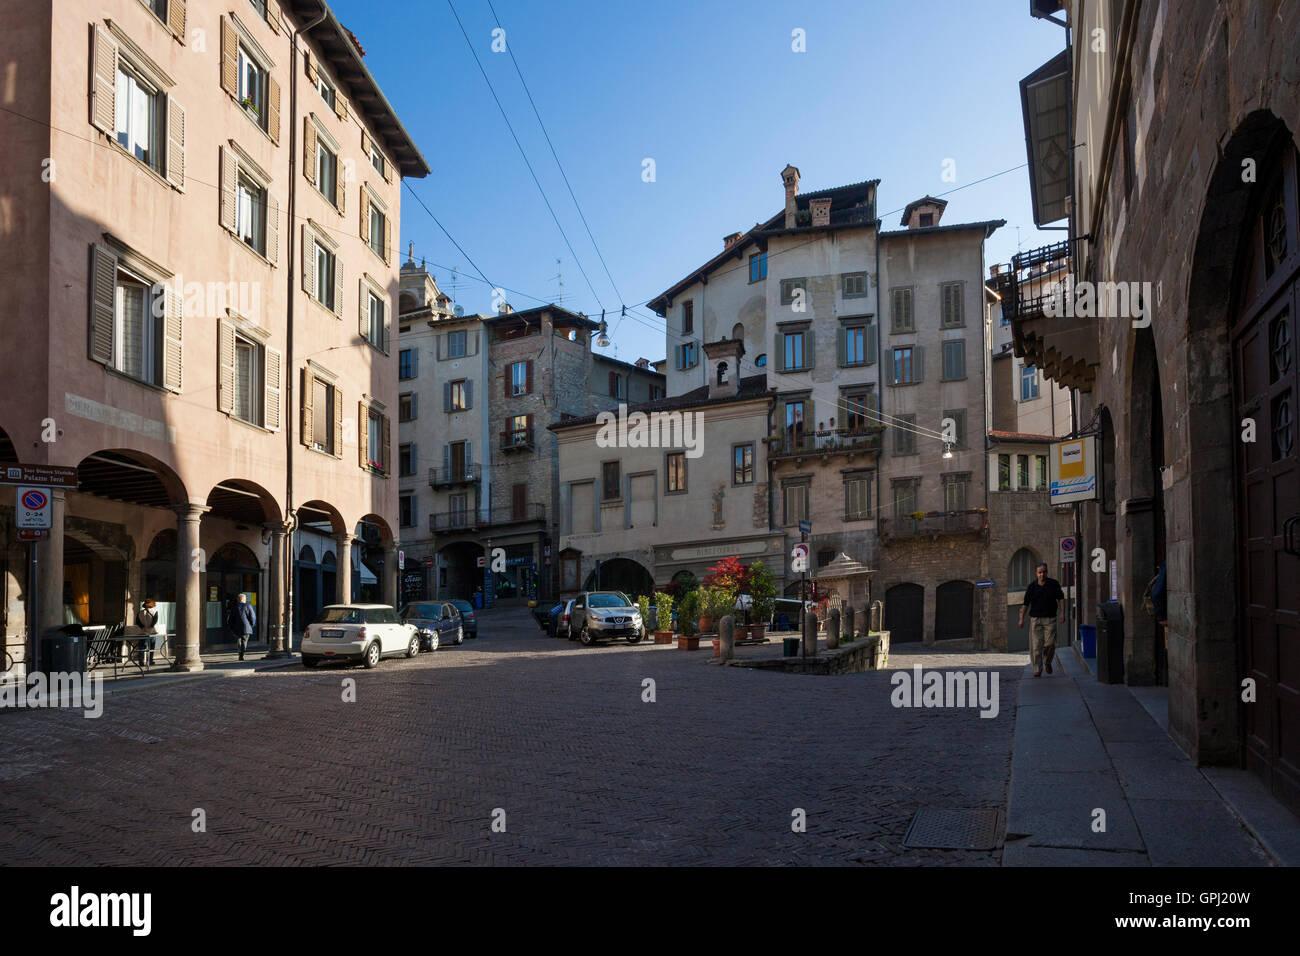 Piazza Mercato Delle Scarpe in Upper Town, Upper station of Bergamo funicular. Lombardia, Italy - Stock Image